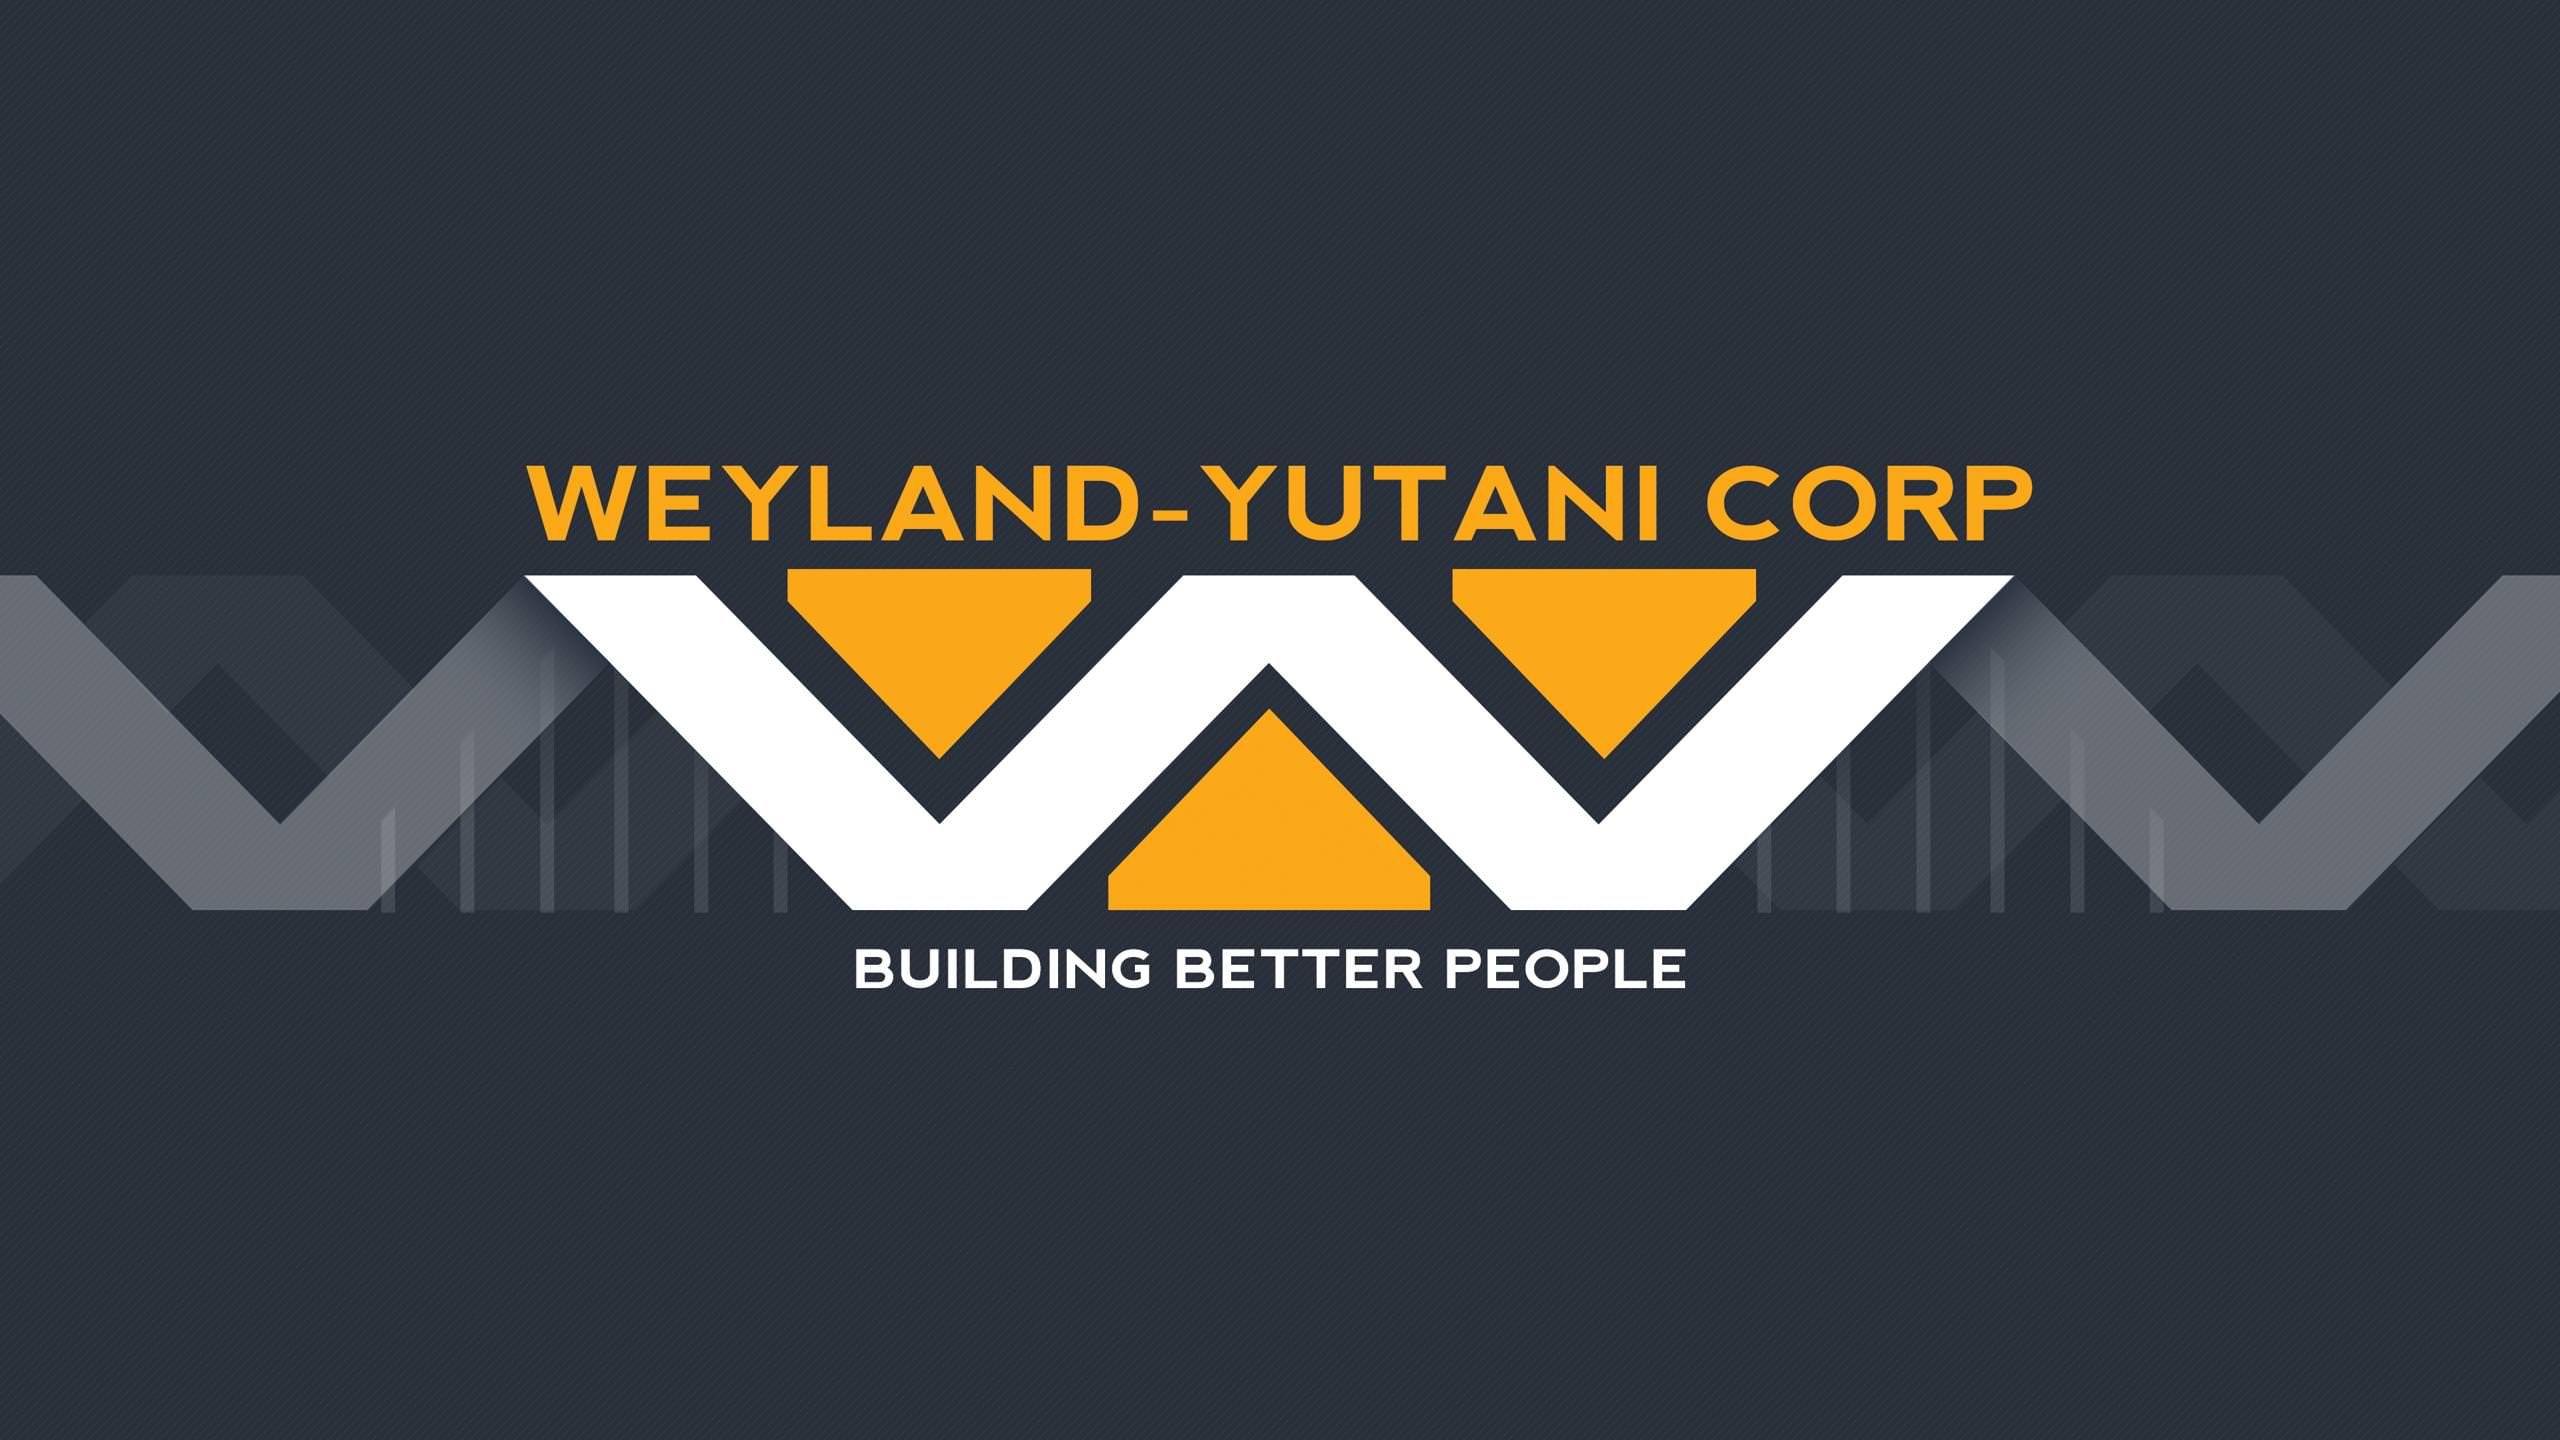 WeylandYutani Corporation [2560 x 1440] (2K) Hd